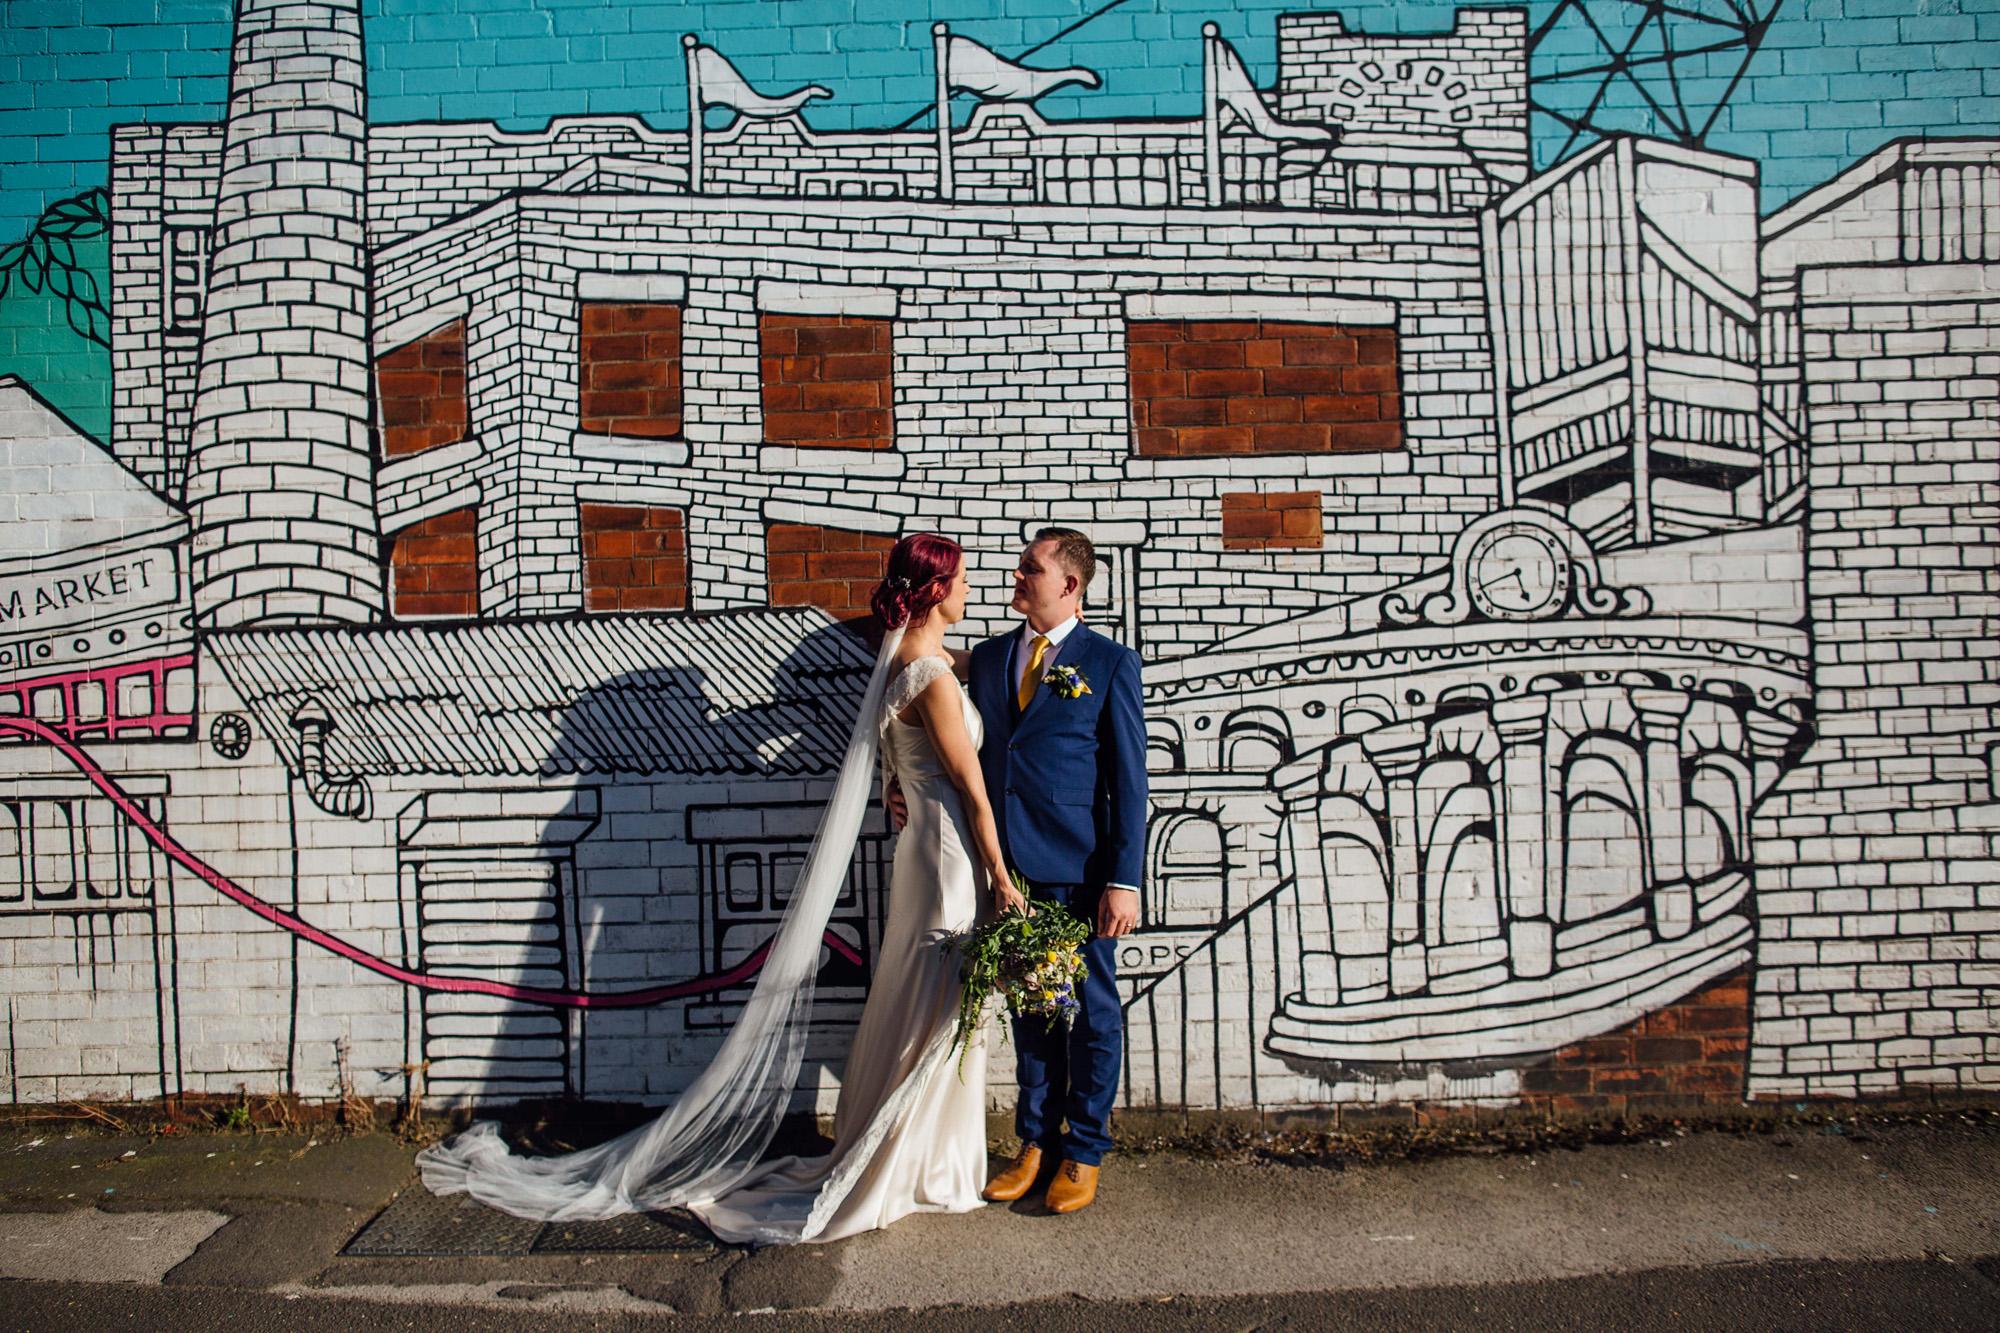 Sarah-Honeysuckle-Bias-Cut-Silk-Vintage-Inspired-Wedding-Gown-Sheffield-Wedding-Kate-Beaumont-51.jpg